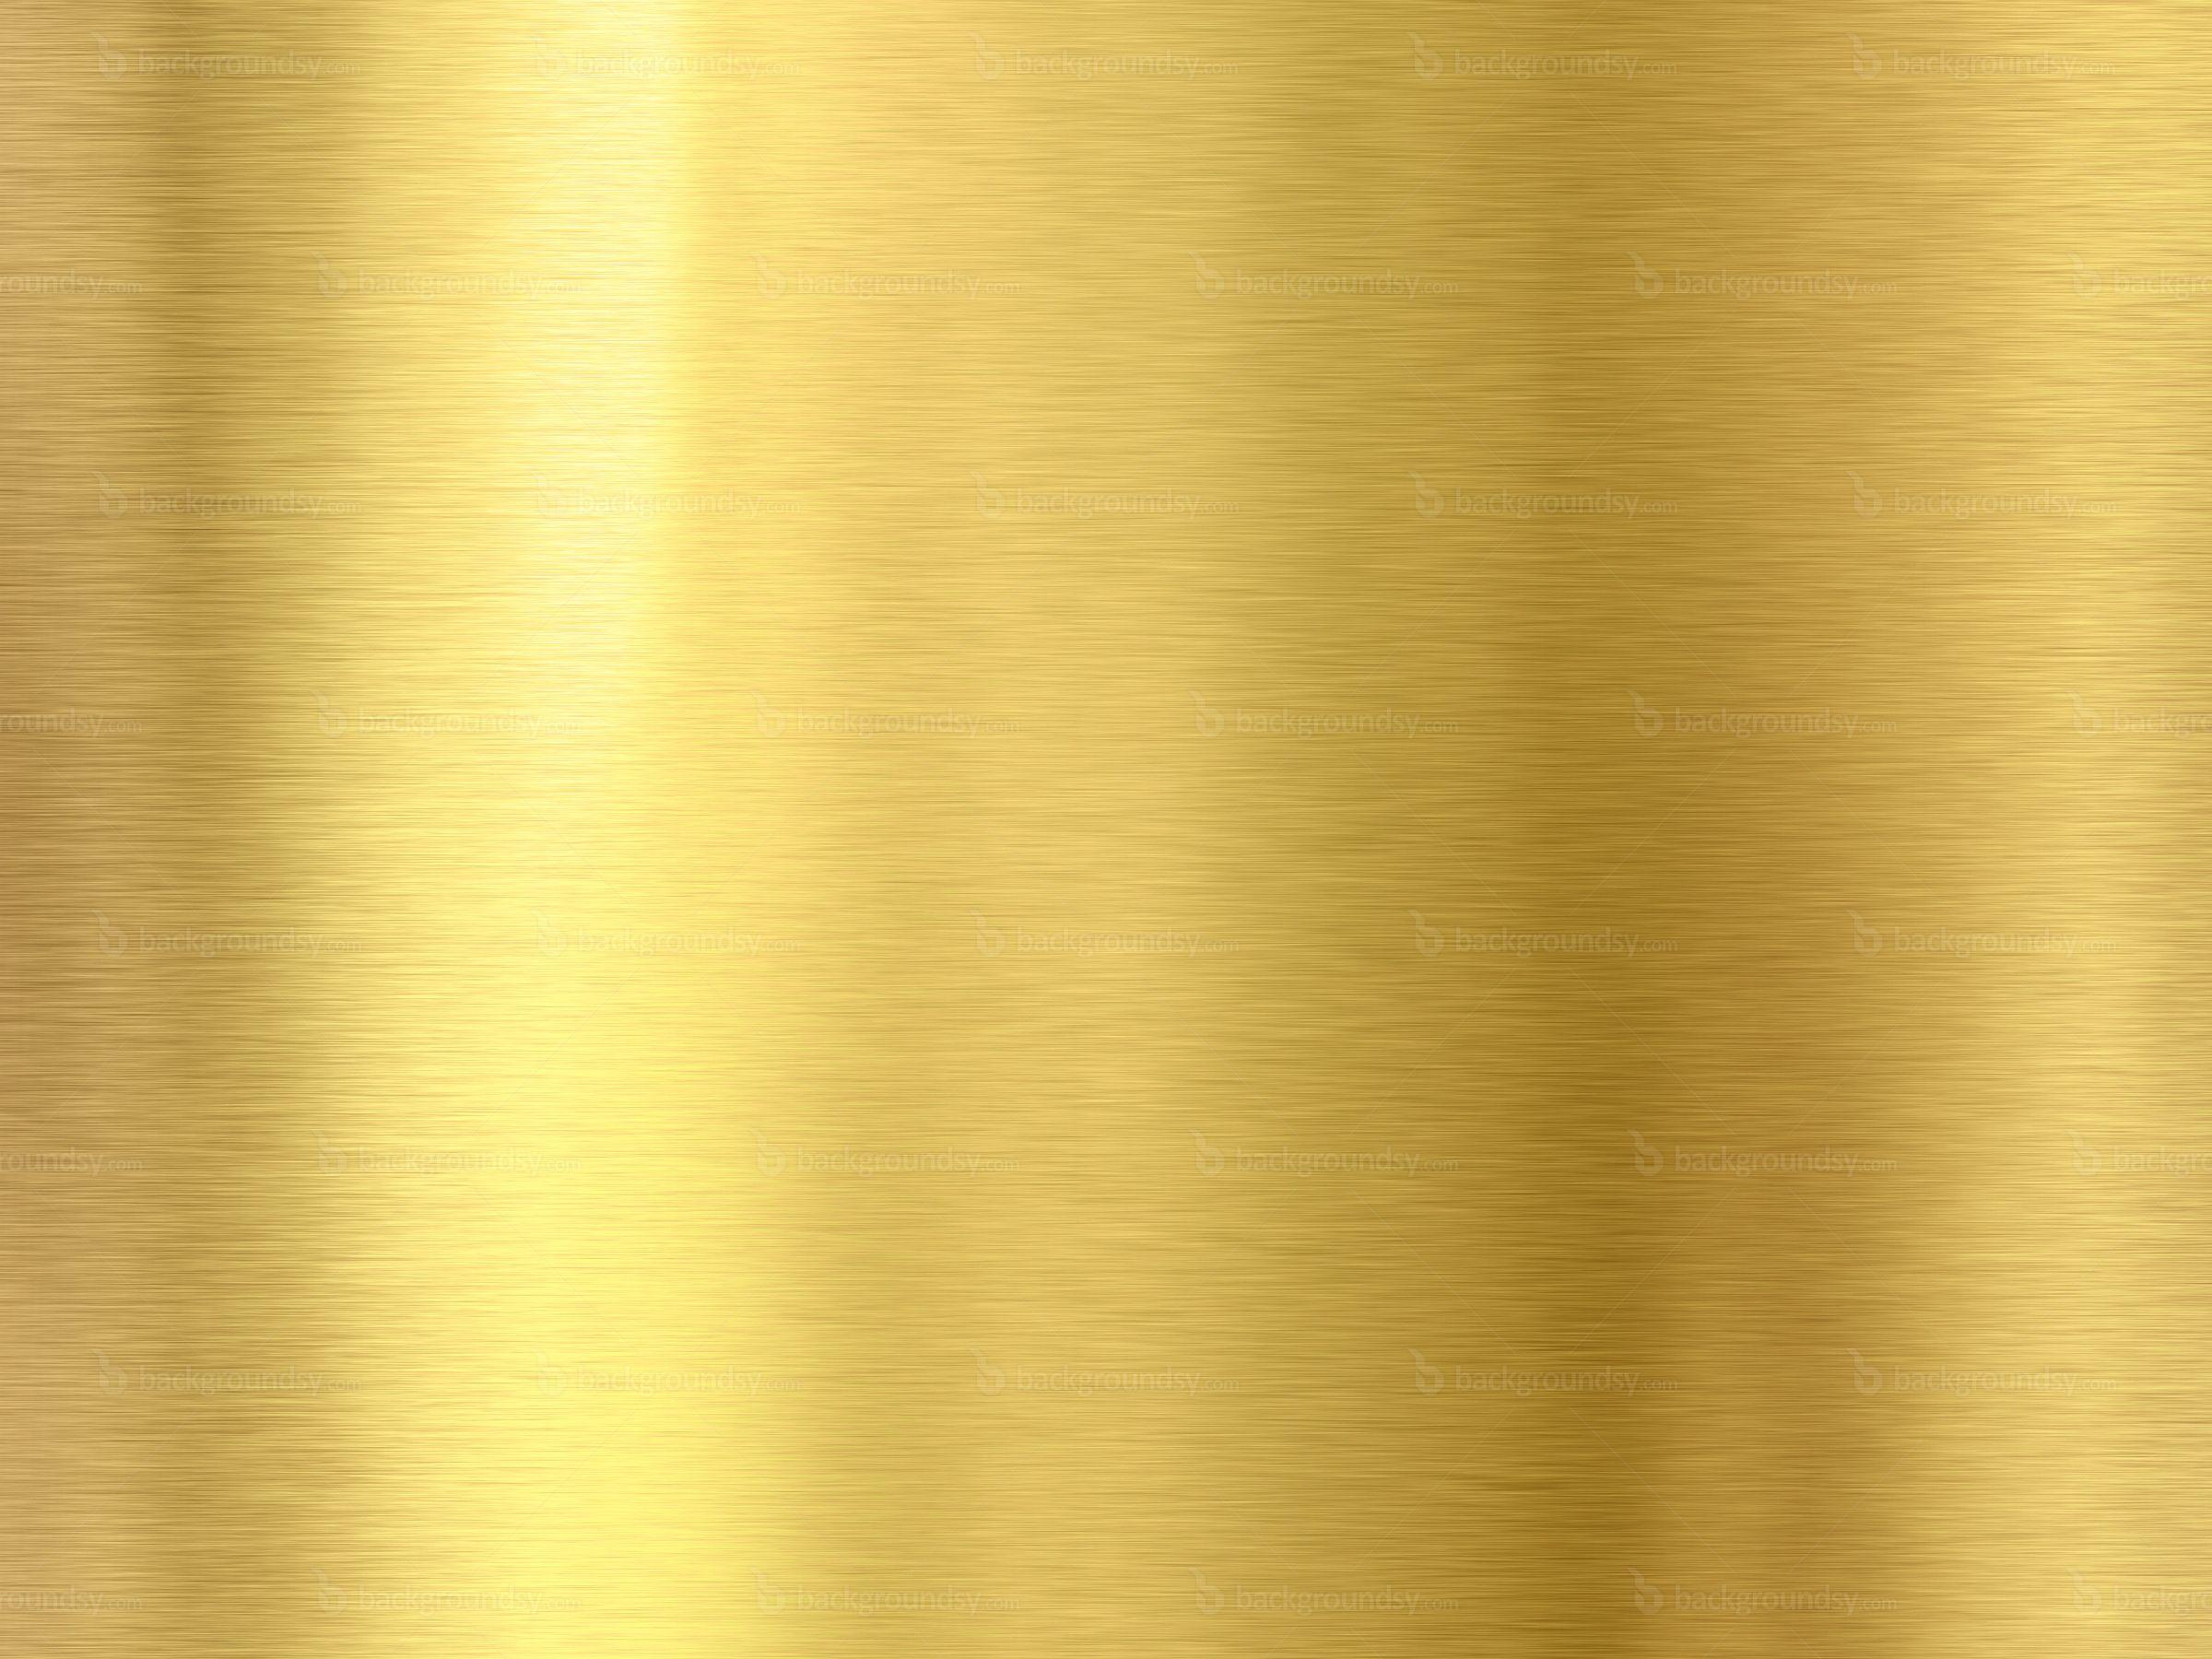 gold level$5,000-$9,999 - Russ AchzetHerb & Lisa BatchelderDavid P. Browne, P.A.Capital BankTim & Suzanne DevittFineMark National Bank & TrustDon & Betty GrosfieldTom & Claire JohannesenChris & Virginia LoydDave & Dottie MinkMcCaw & Associates Investment GroupNational MediaJuan Ramirez Lawn and LandscapeJack & Barbara RoessnerDick & Priscilla SingletonDaryl & Jackquelyn SpoerlAnn ThornburgU.S. Trust - Bank of America Private Wealth ManagementNorm & Denise WellsKent & Martie WhiteAllen & Ruth Zacharias